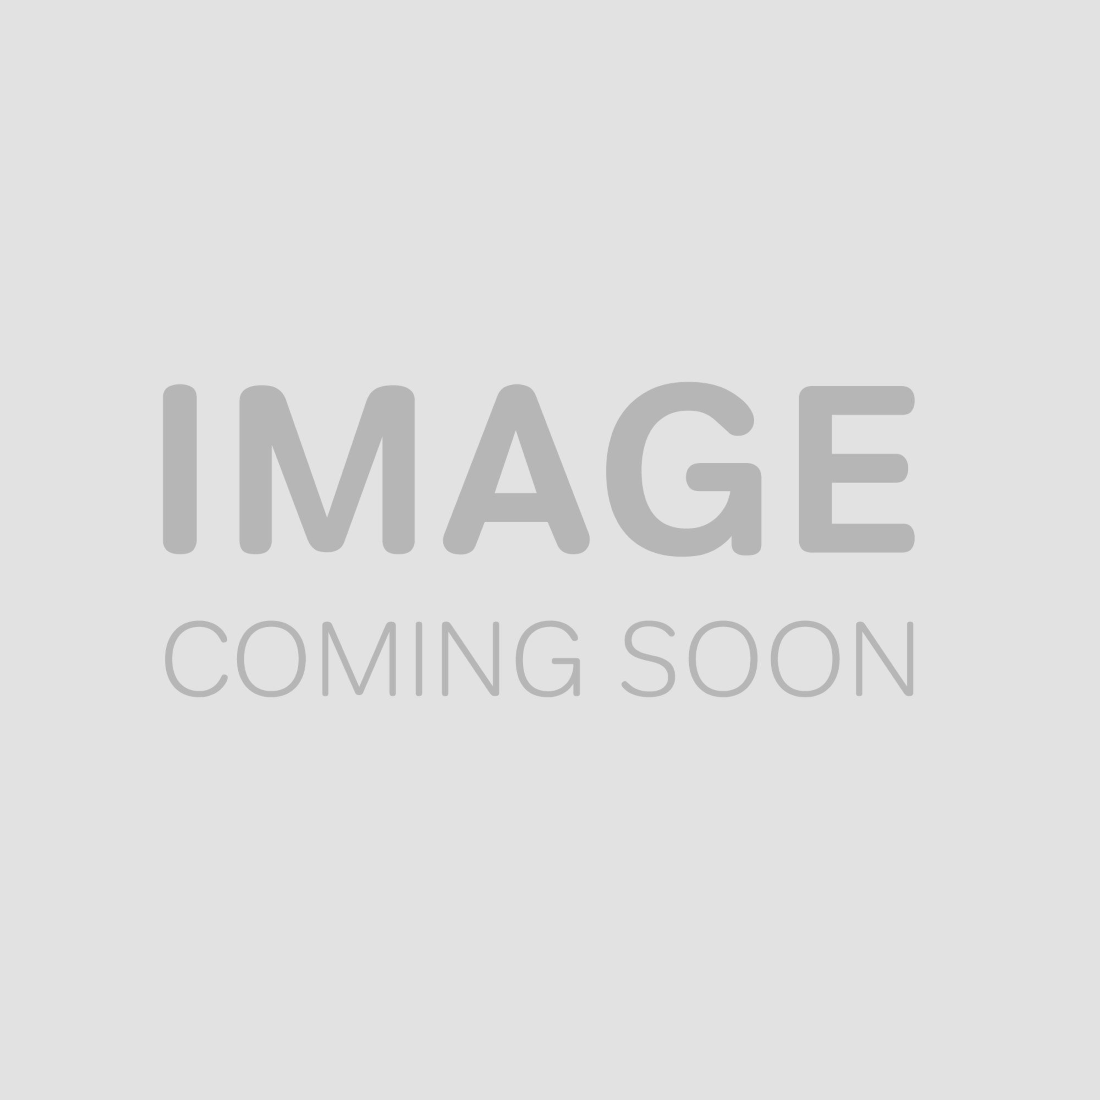 Single Ashmount Mattress